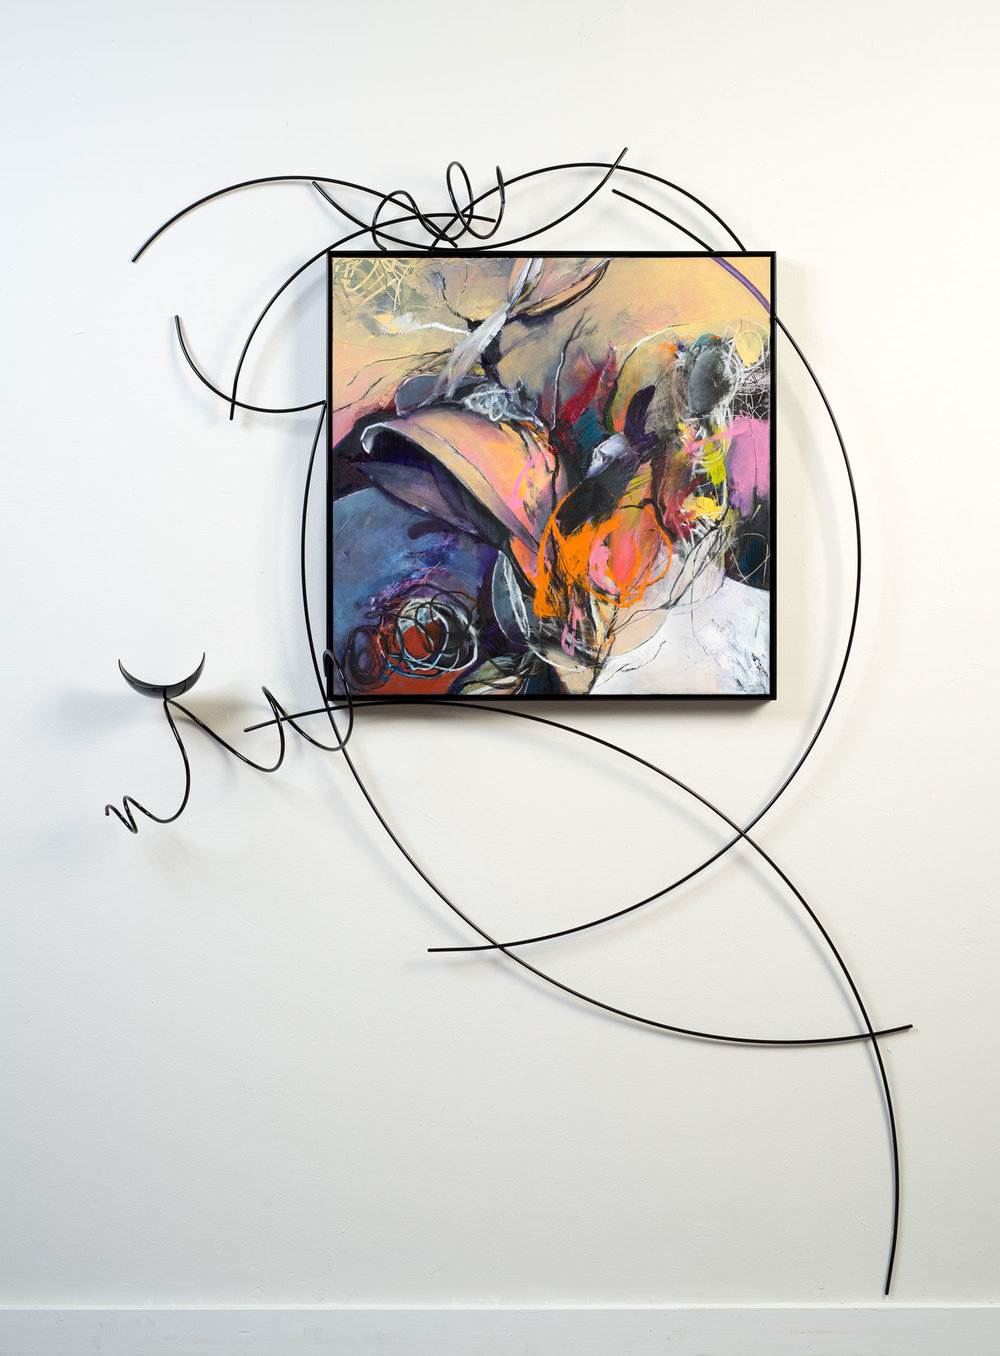 Entanglement #6